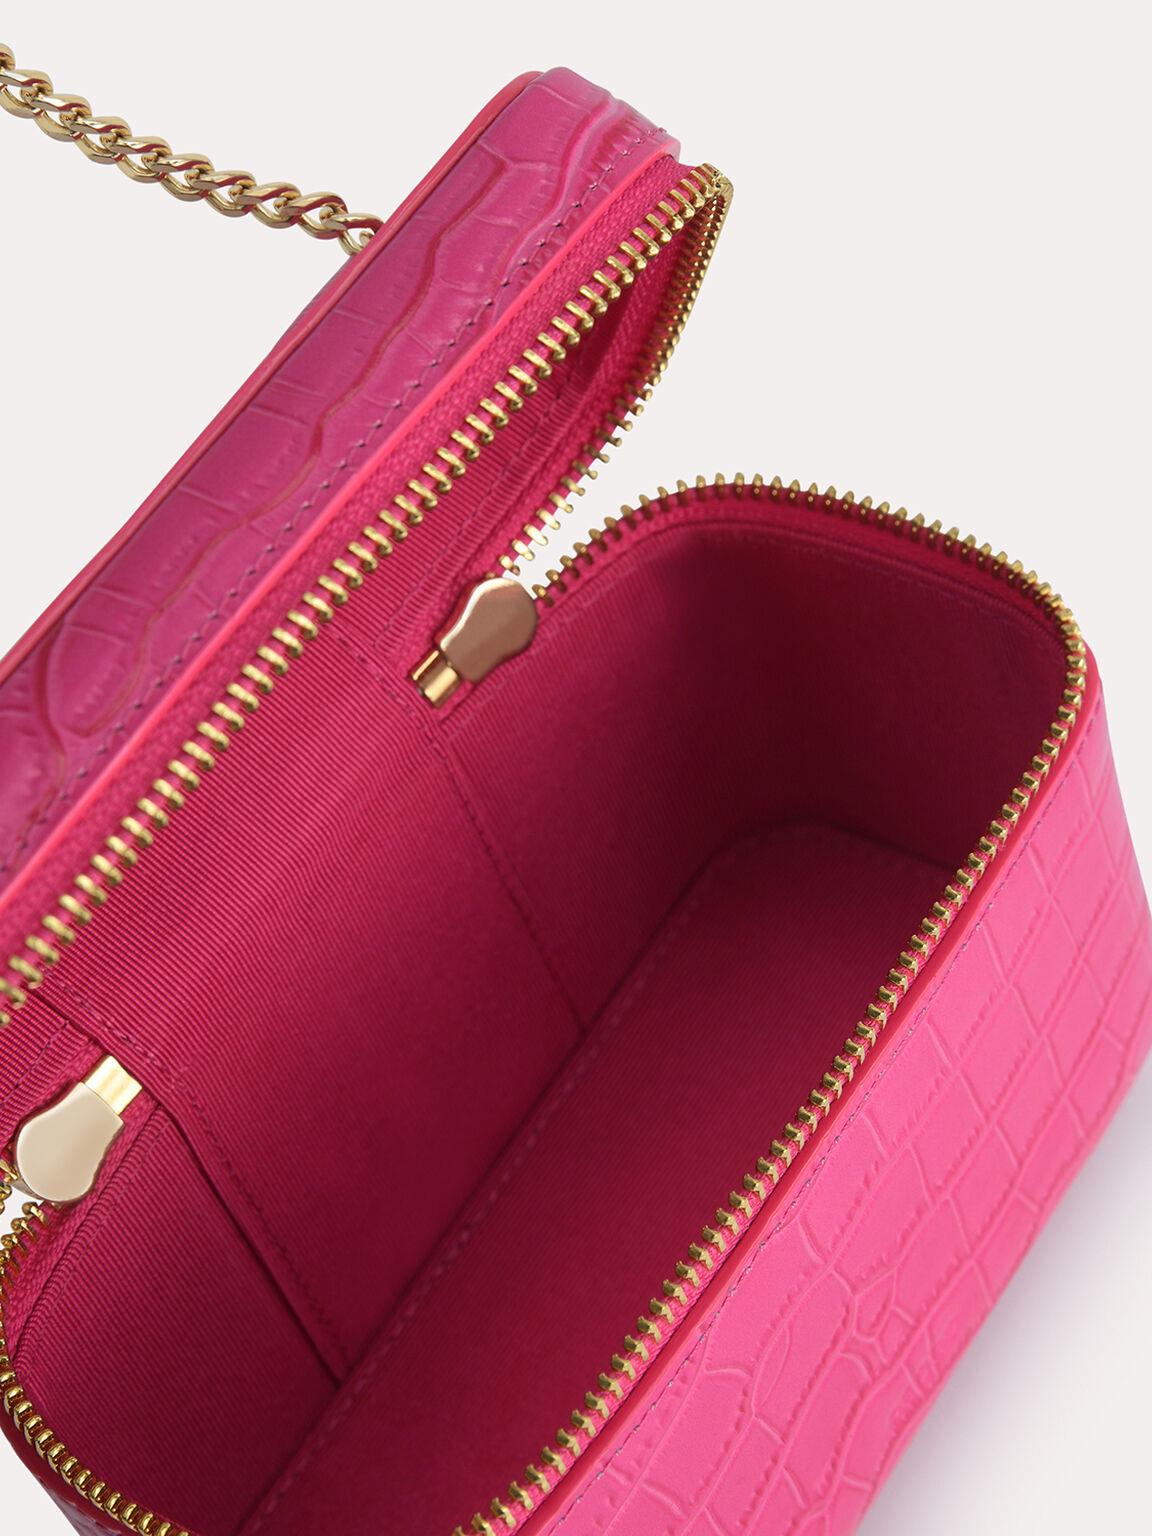 Textured Leather Vanity Case, Fuchsia, hi-res